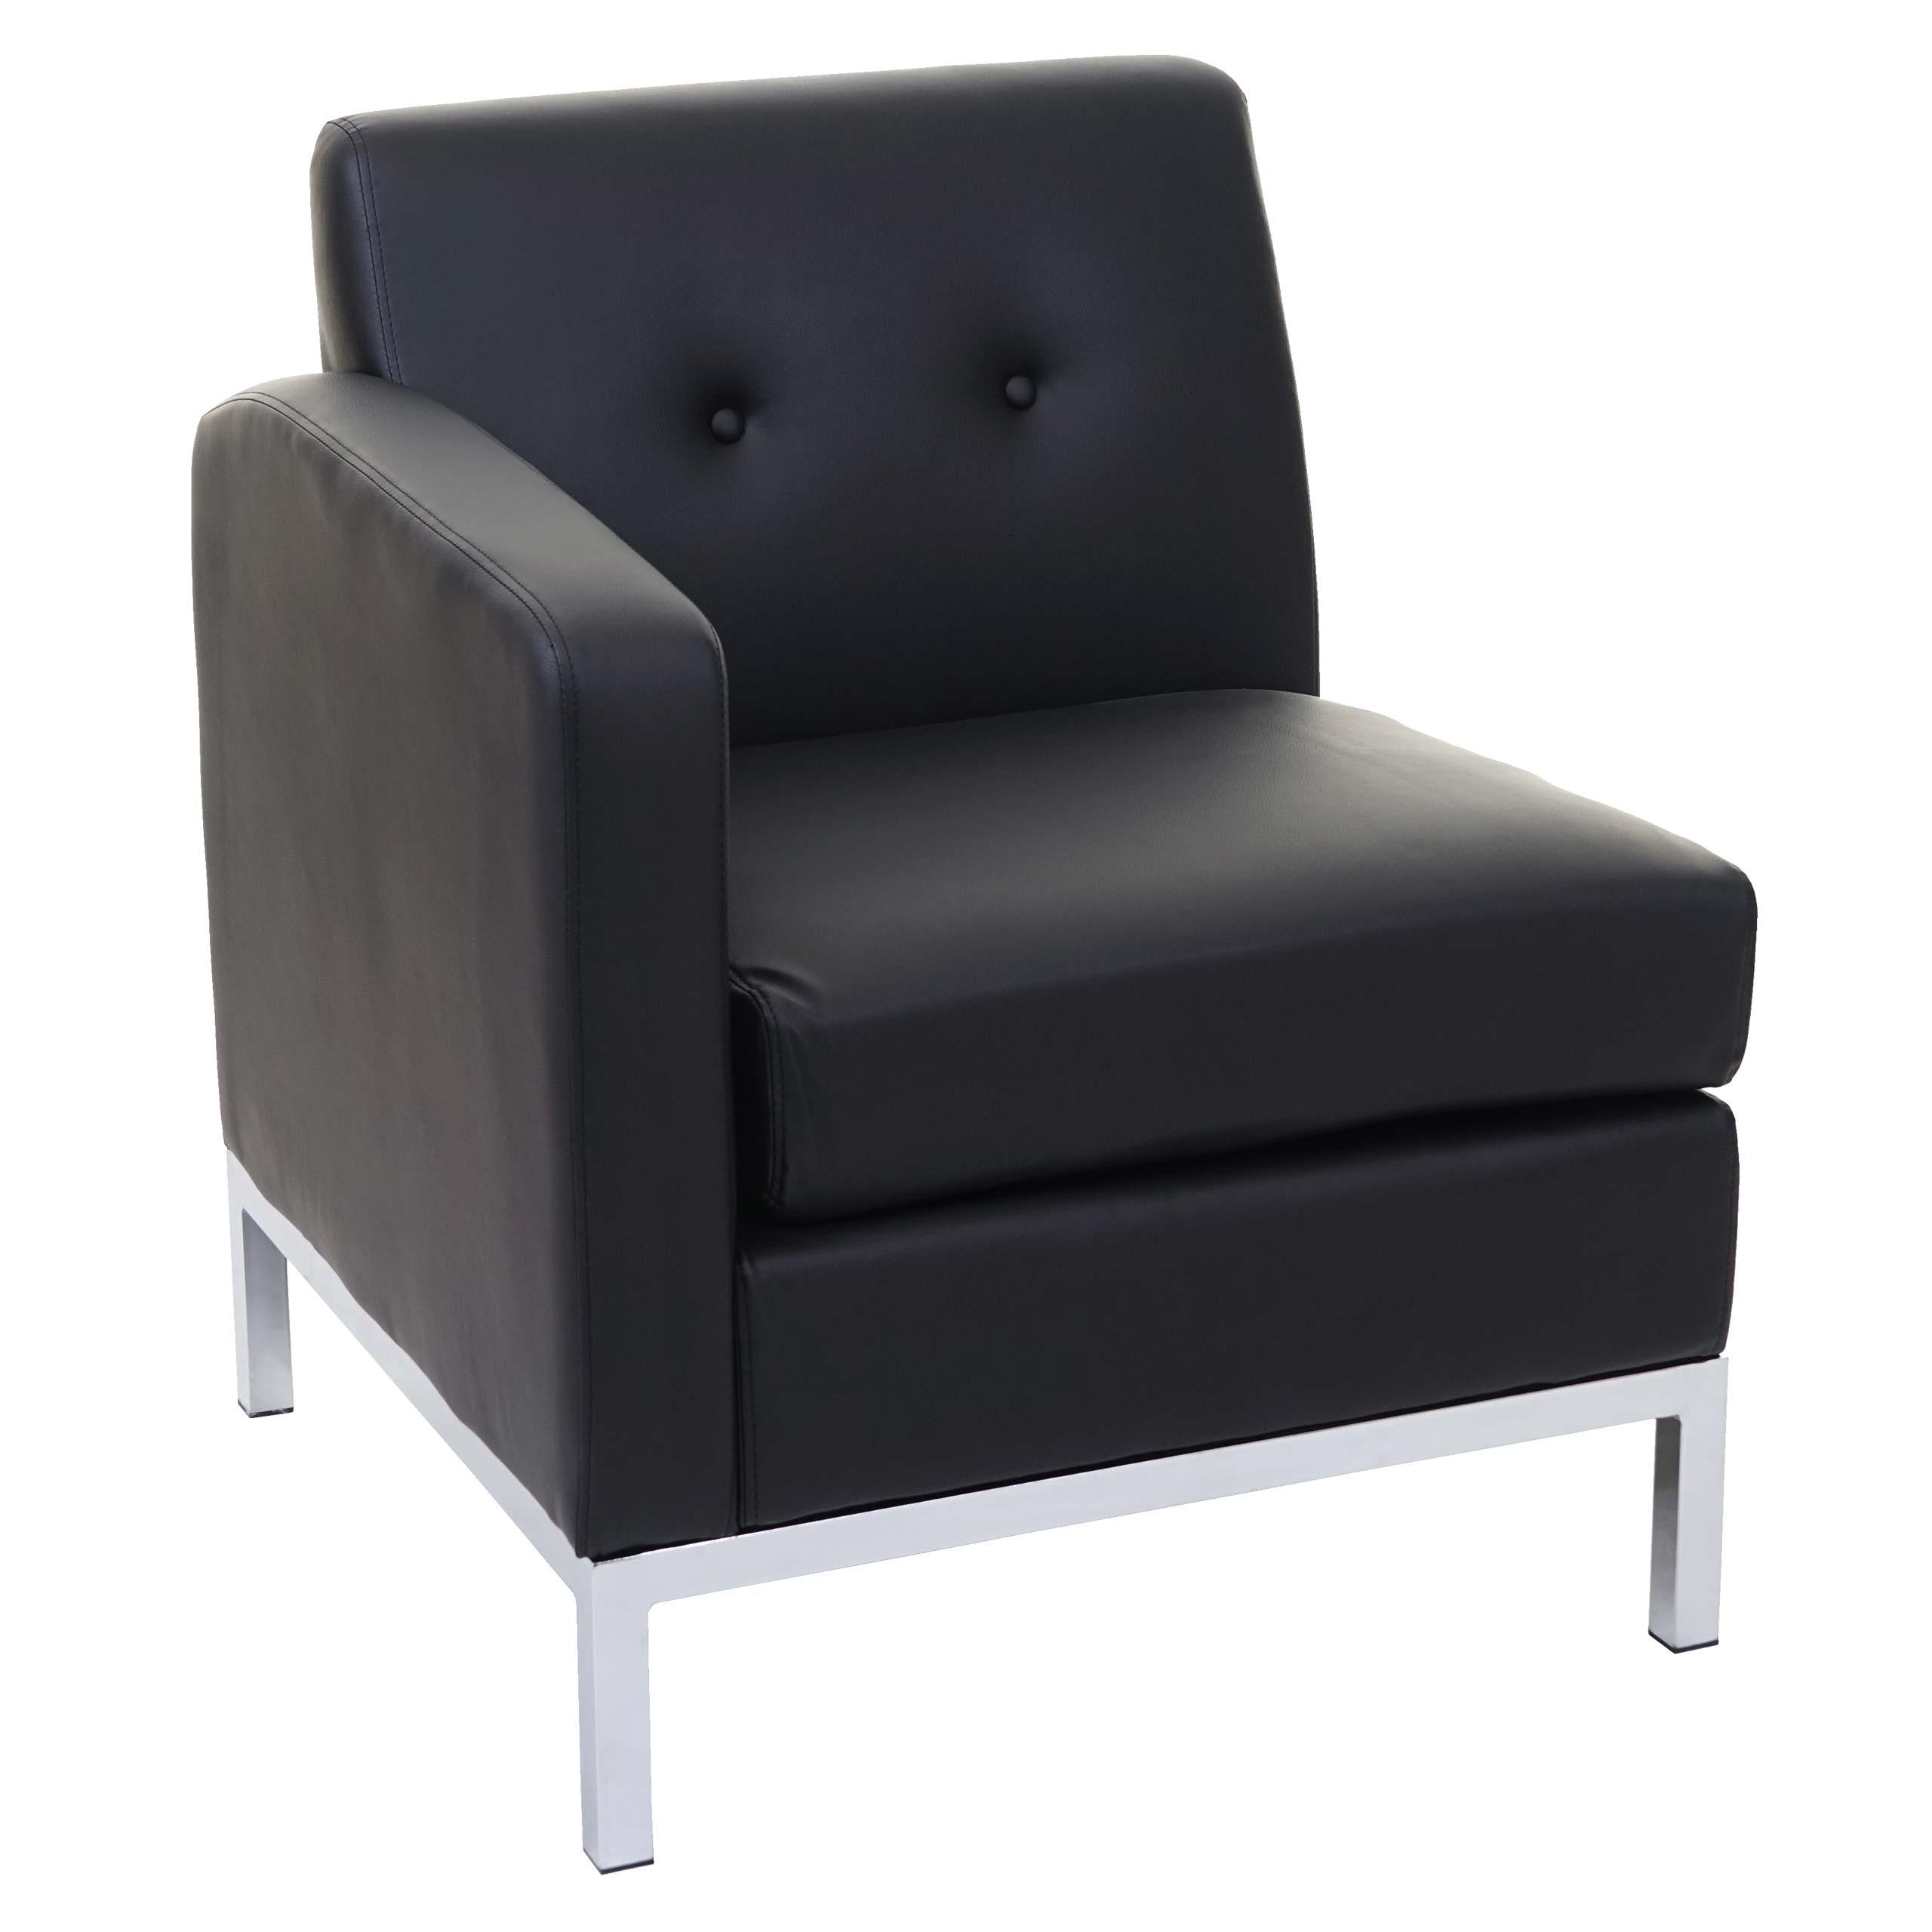 sessel hwc c19 modular sofa seitenteil links mit armlehne erweiterbar kunstleder schwarz. Black Bedroom Furniture Sets. Home Design Ideas